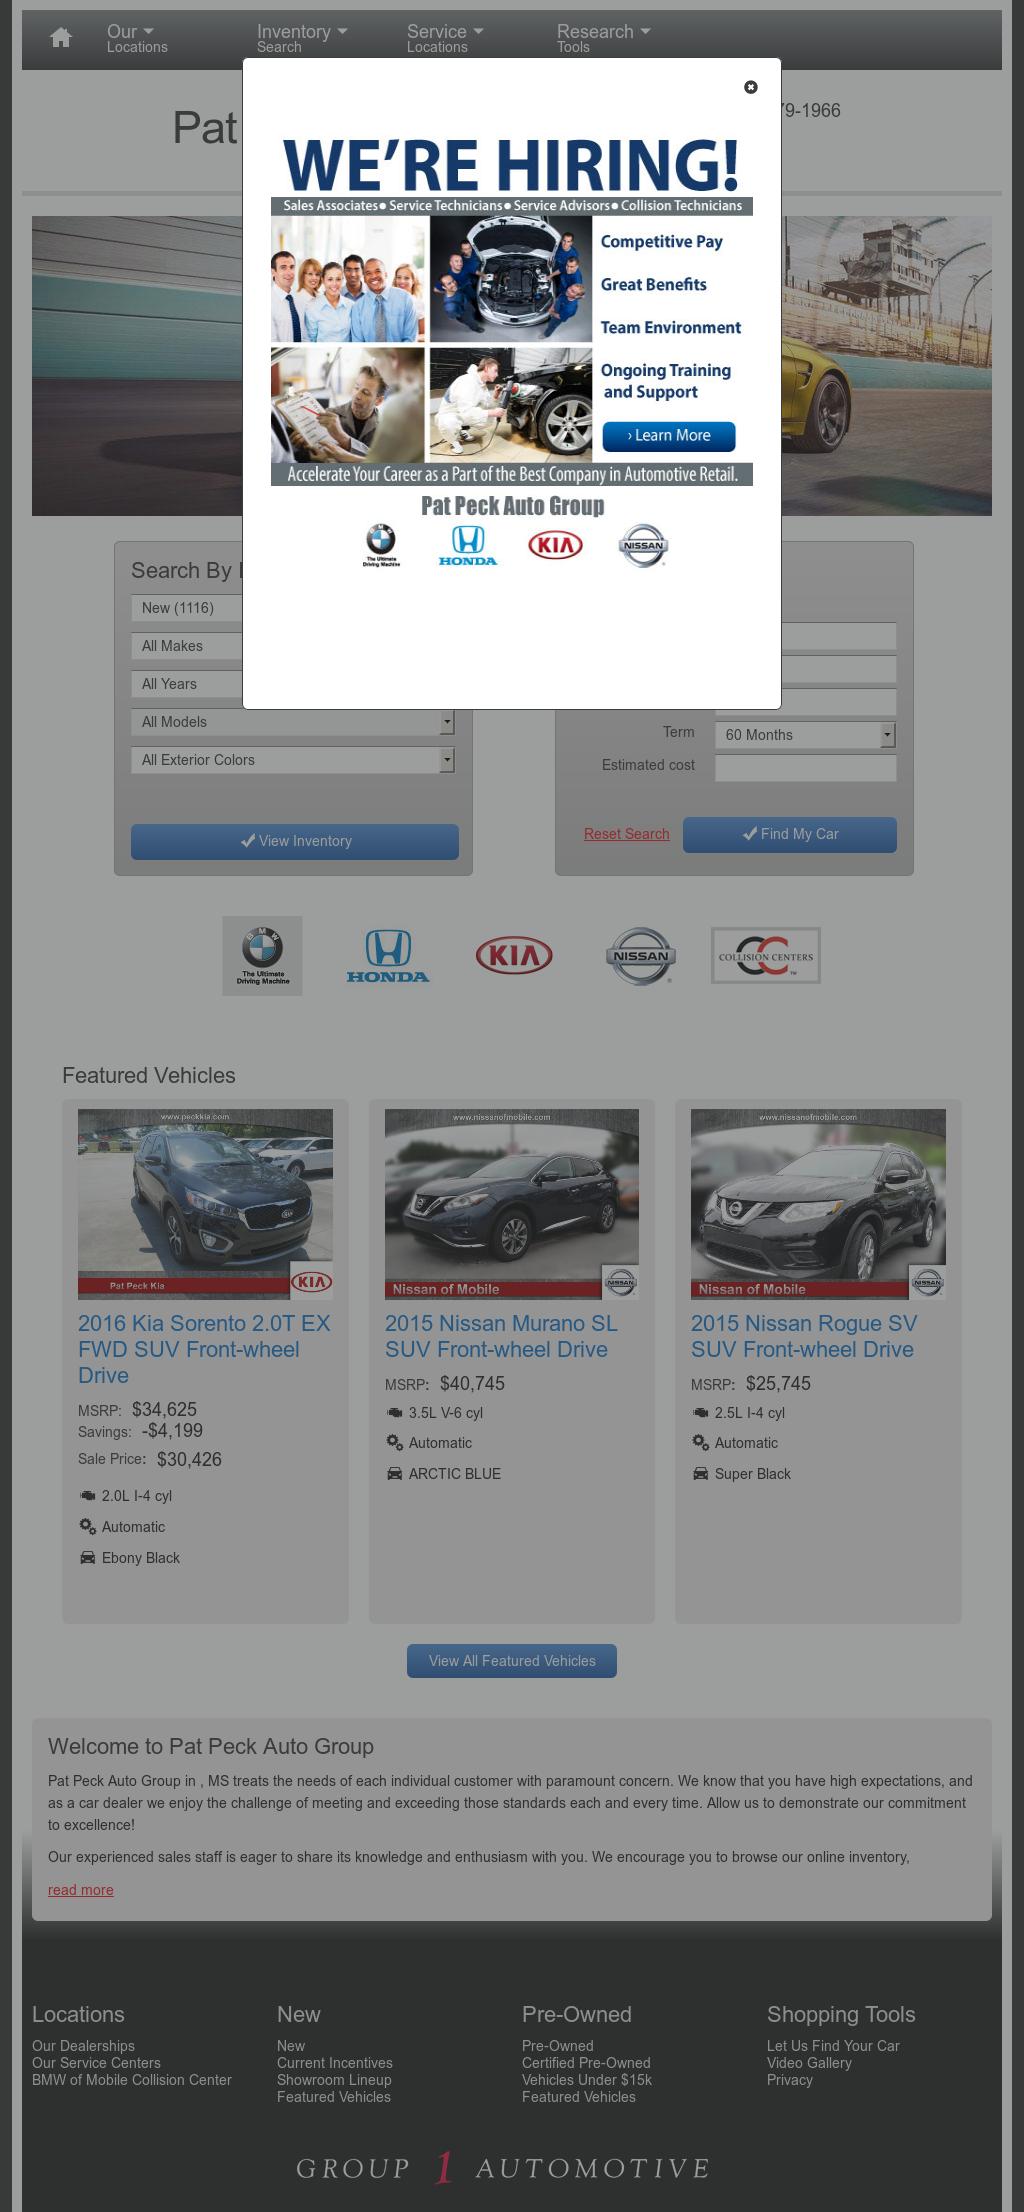 Owler Reports - Pat Peck Auto Group Blog New Nissan Maxima